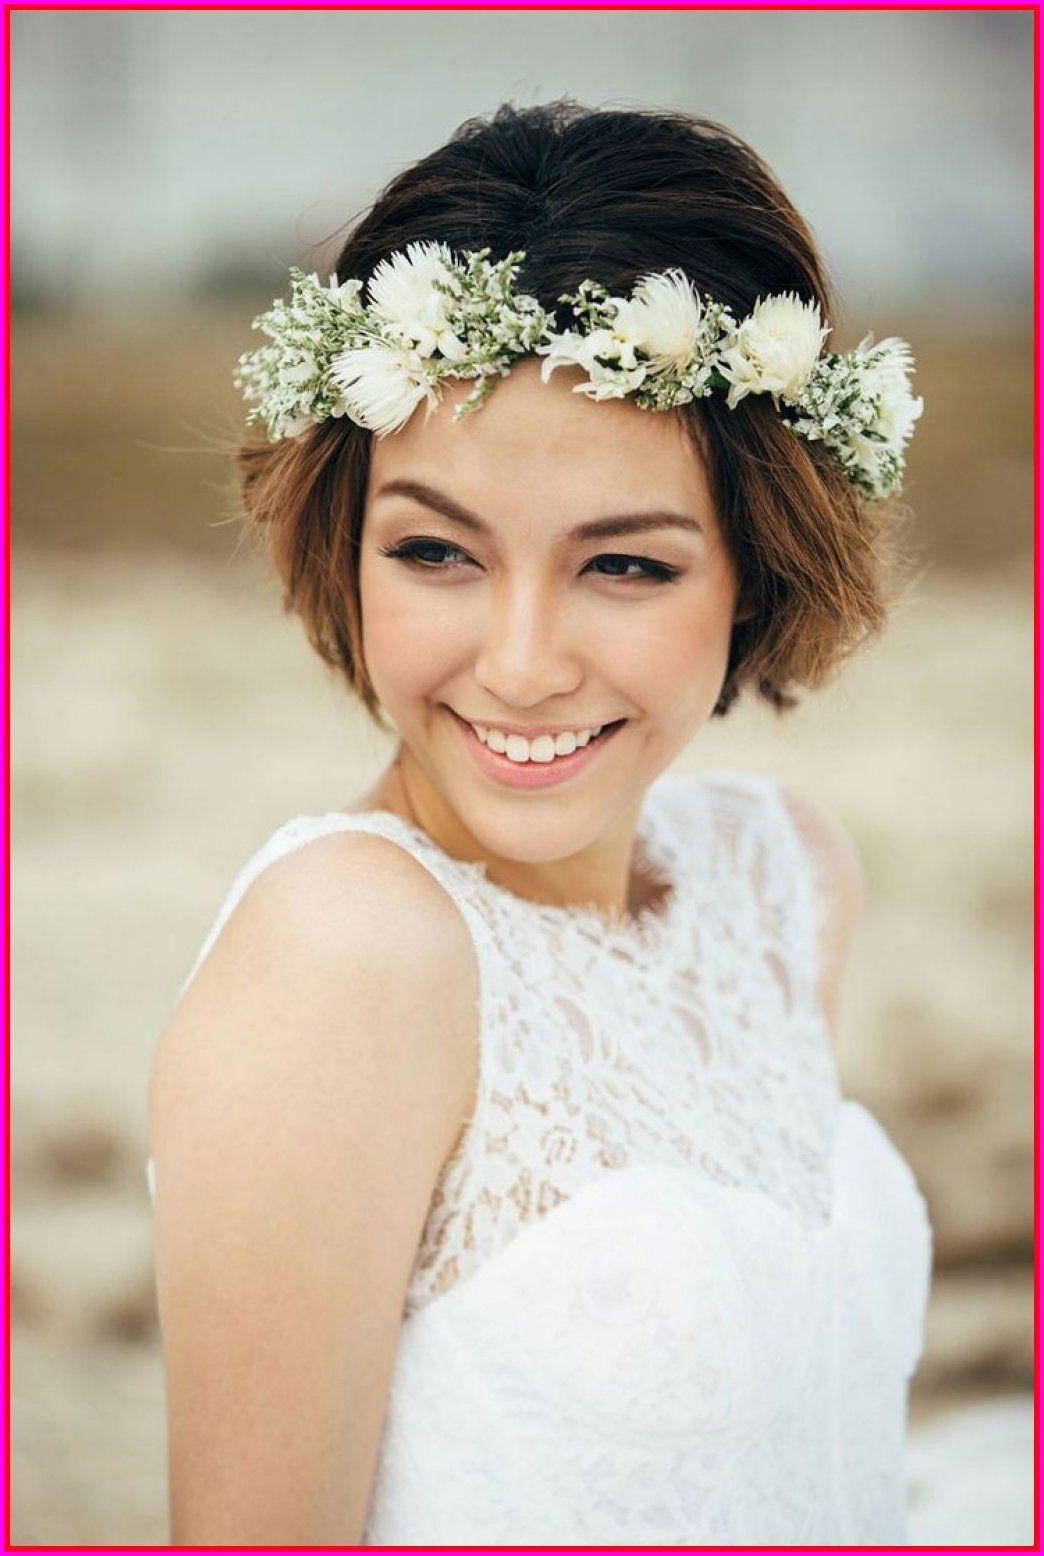 best 50 wedding short hairstyles with flowers, | pregnancy